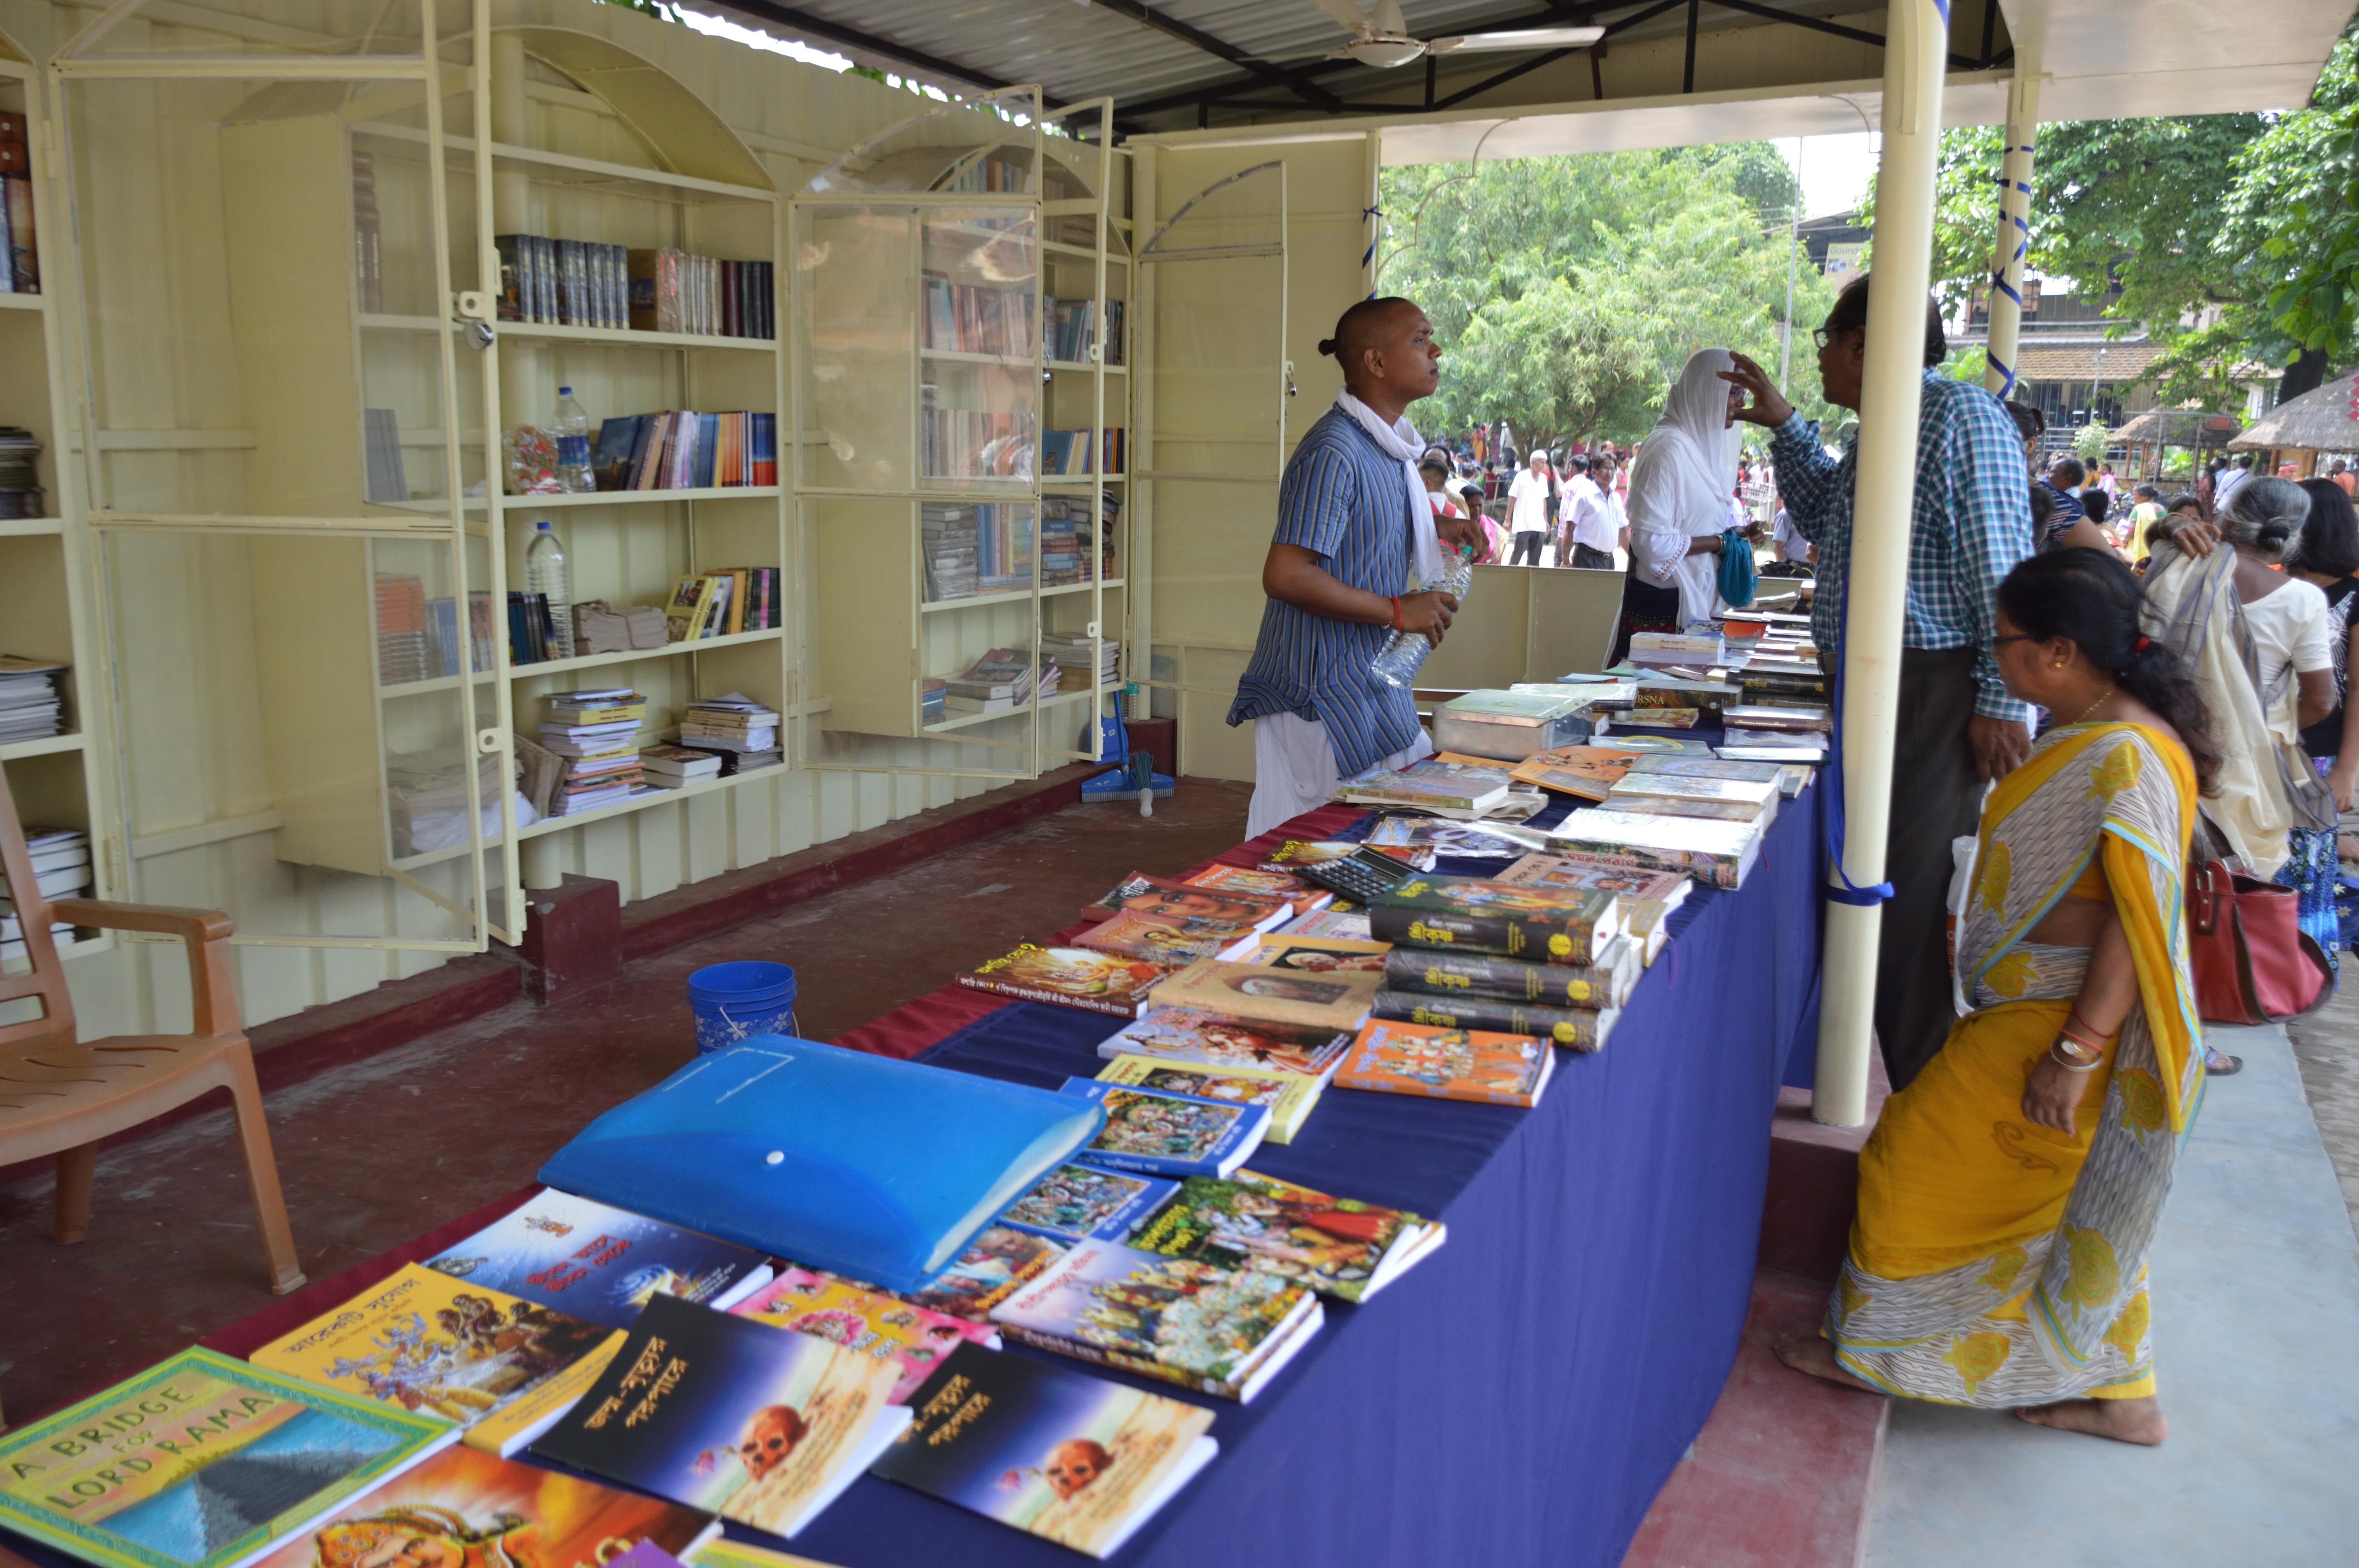 File:Book Stall - ISKCON Campus - Mayapur - Nadia 2017-08-15